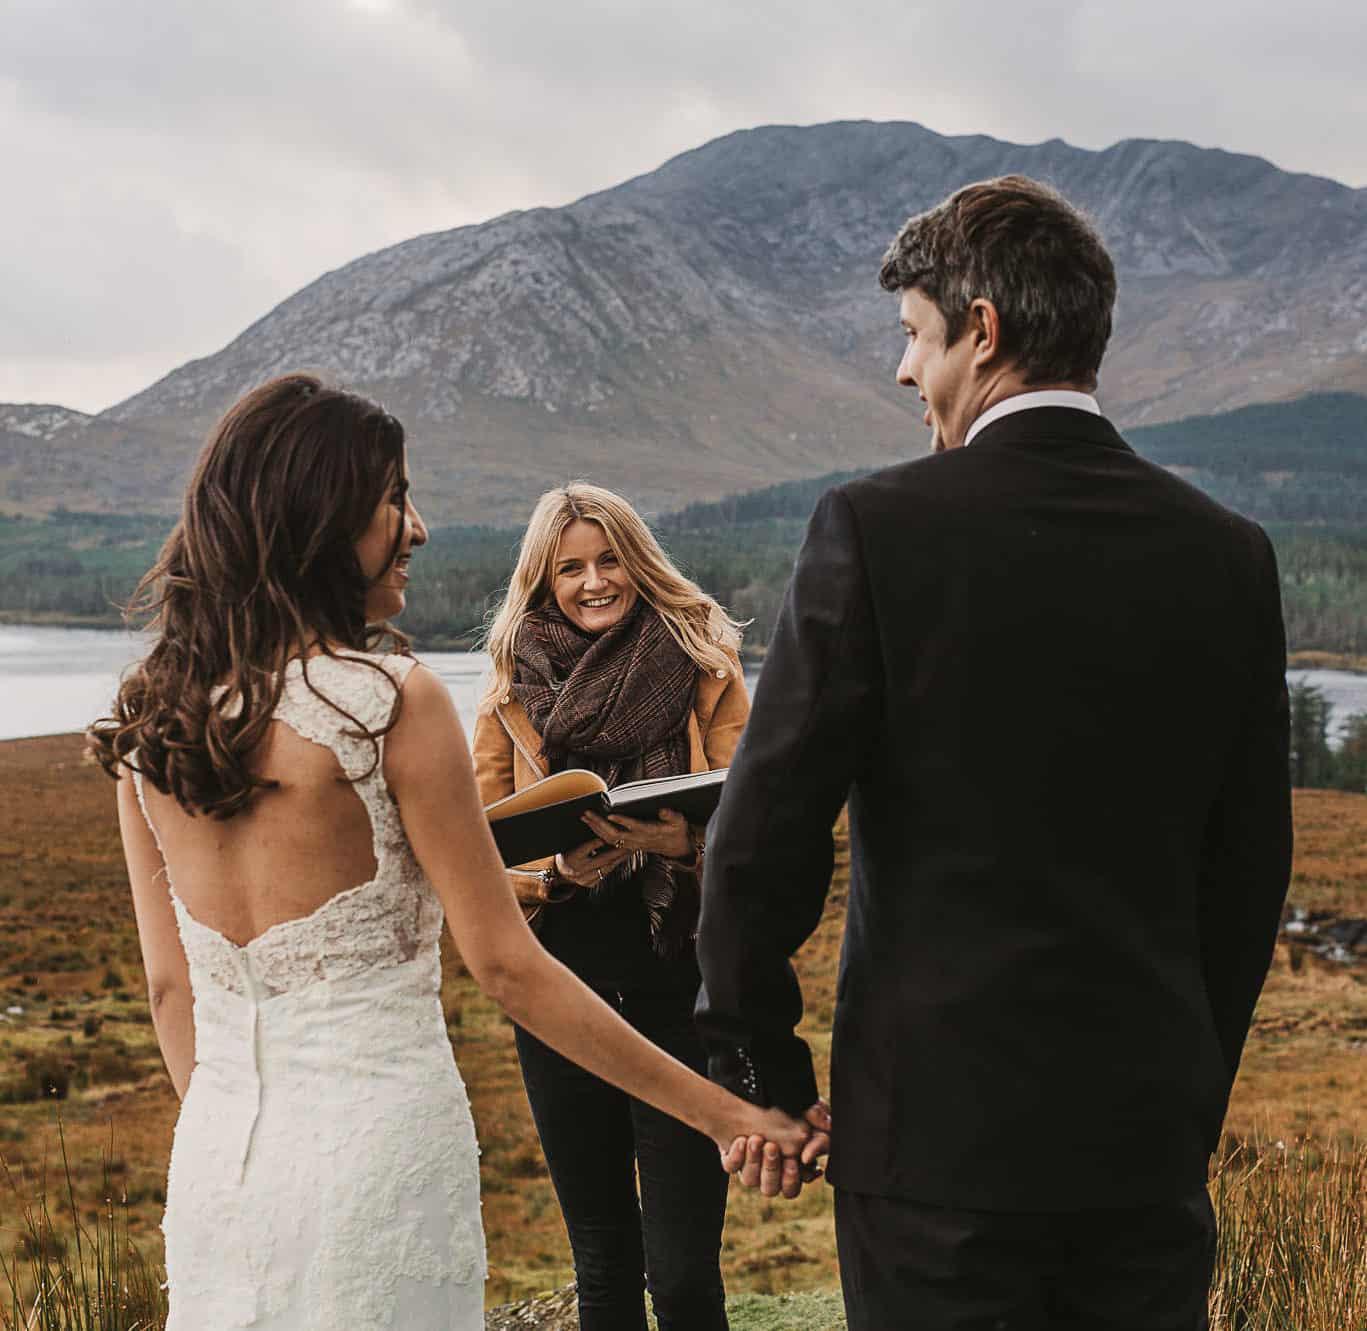 Twin Flames elopement & Celebrancy @ connemara Ireland. Shot by Tommy@weddingsbymoltensky.com. Elope in Ireland to enjoy the beauty of Connemara